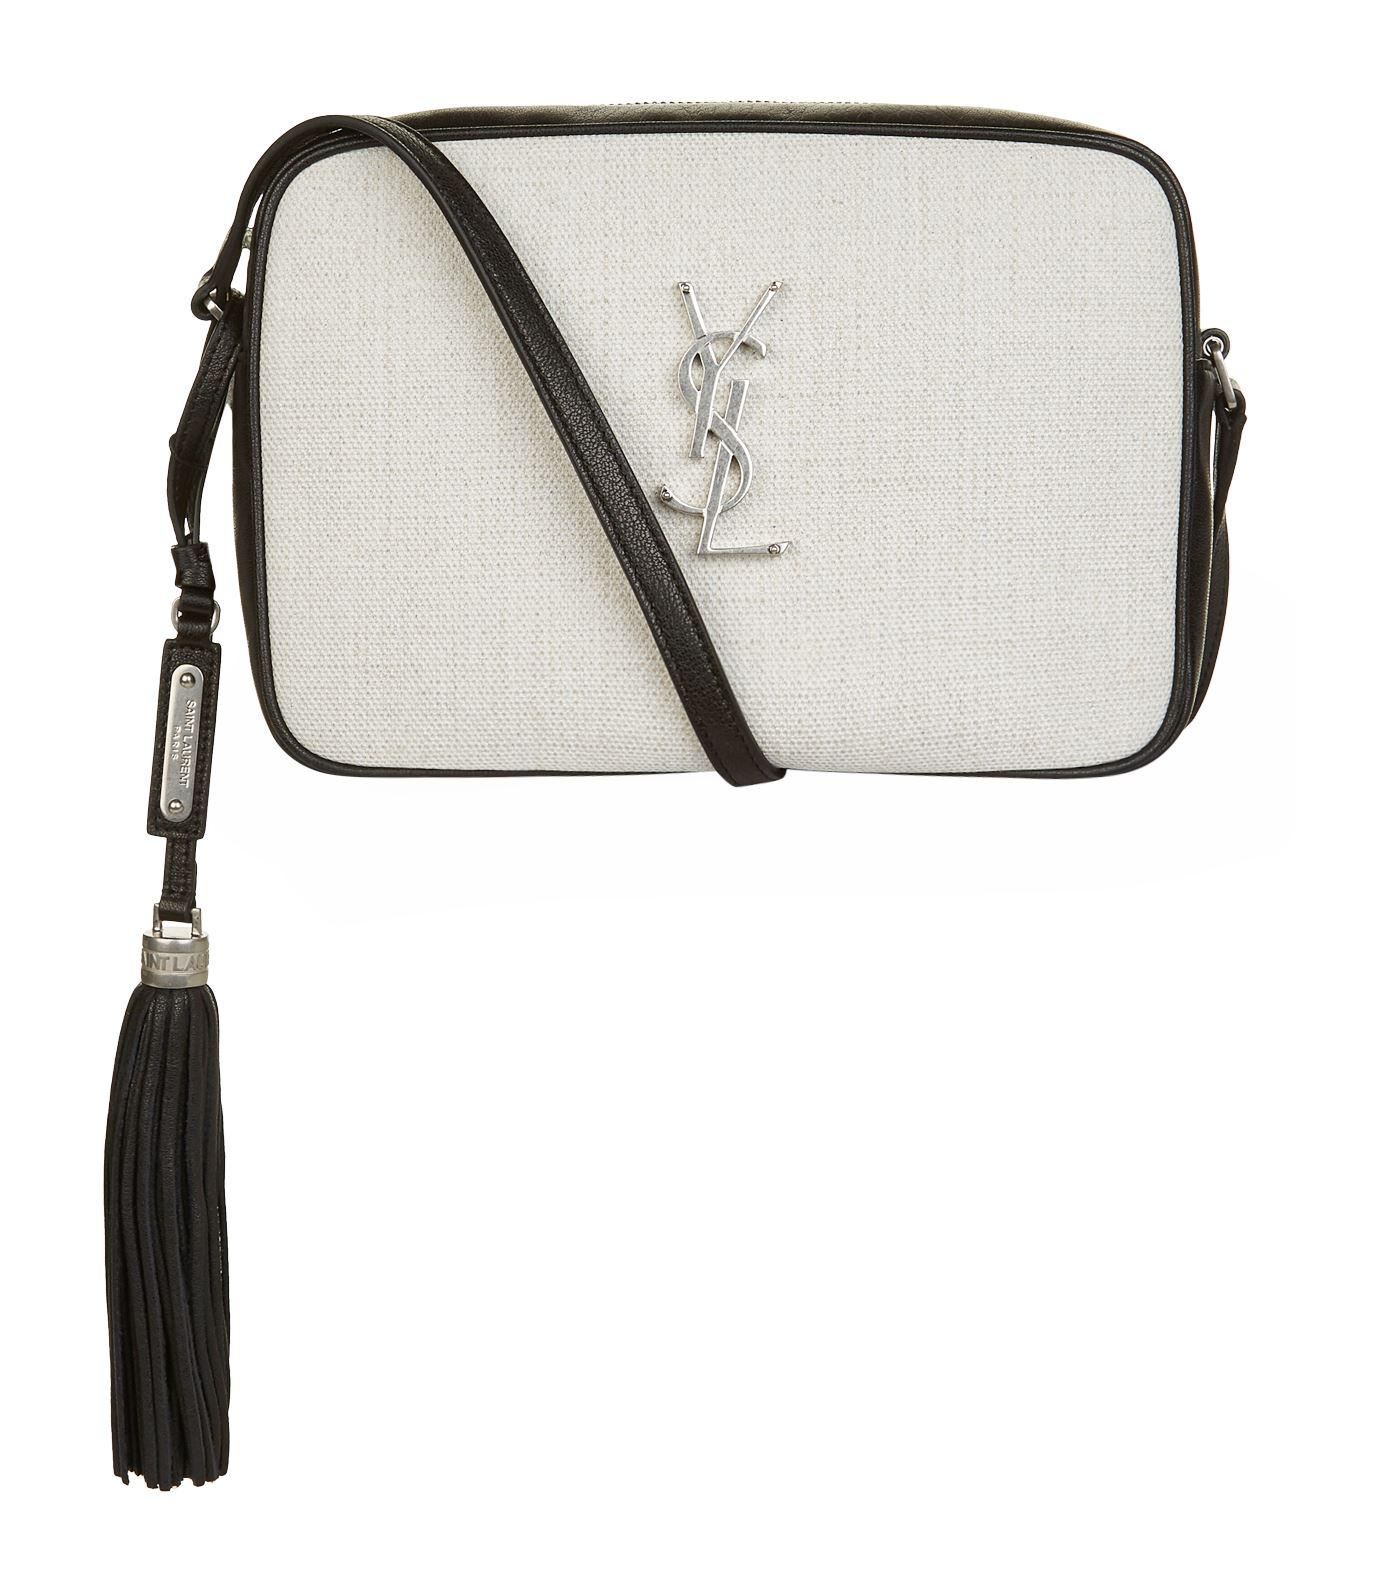 1a64a04756e Saint Laurent Lou Camera Bag Linen Canvas/leather White in White - Lyst